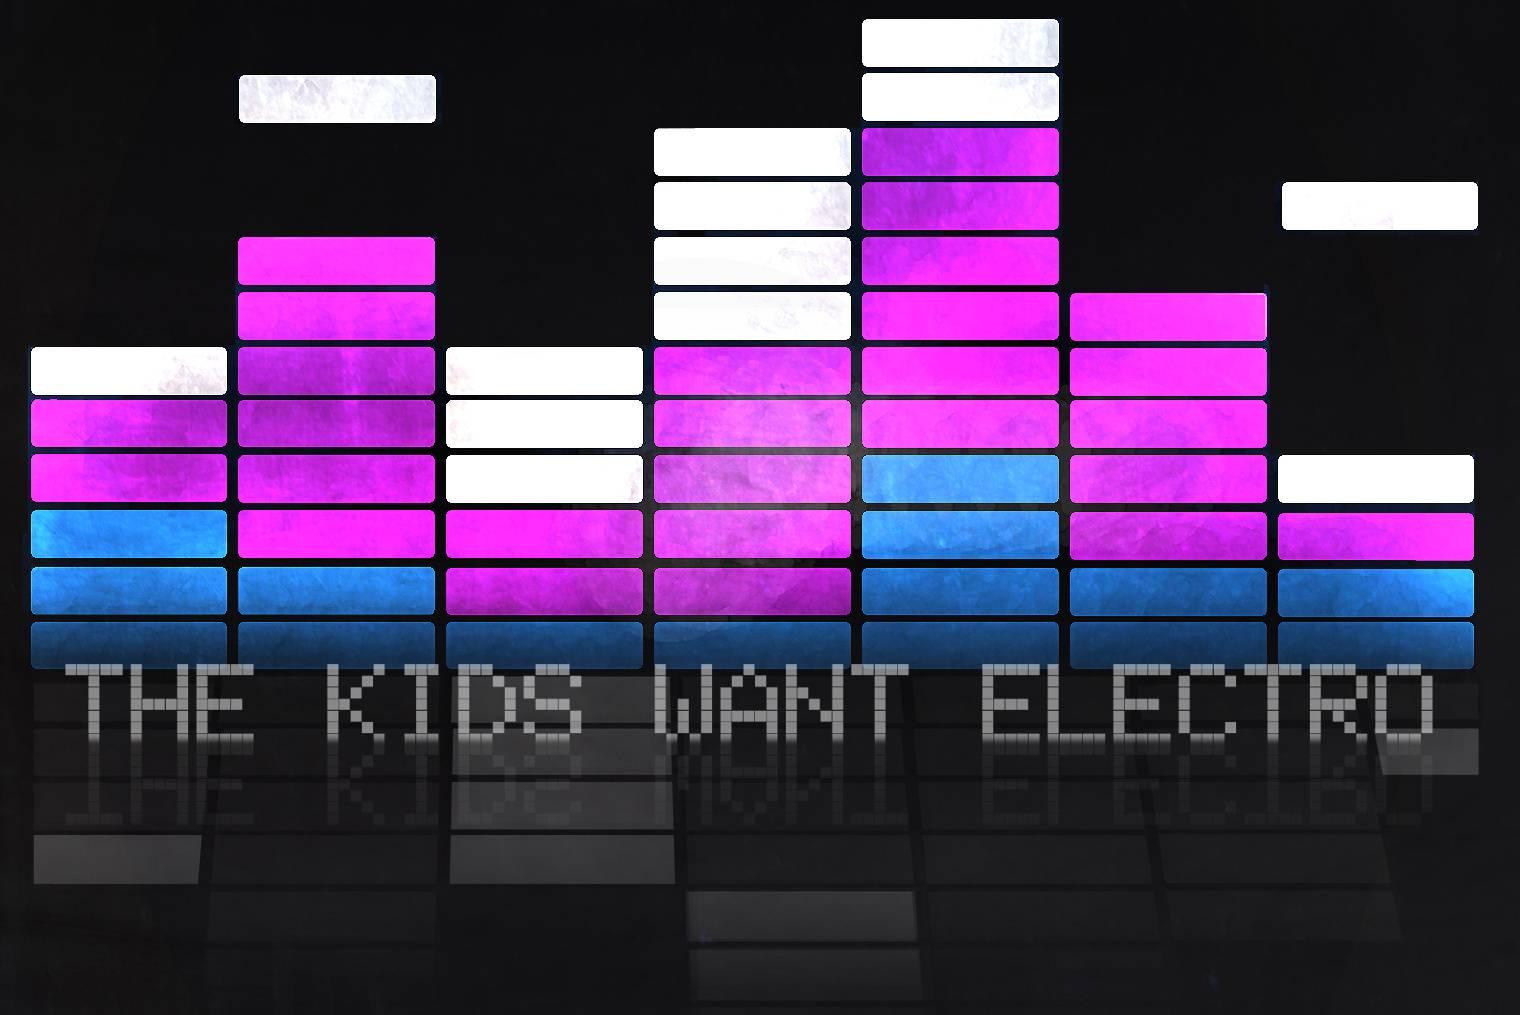 The Kis Want Electro